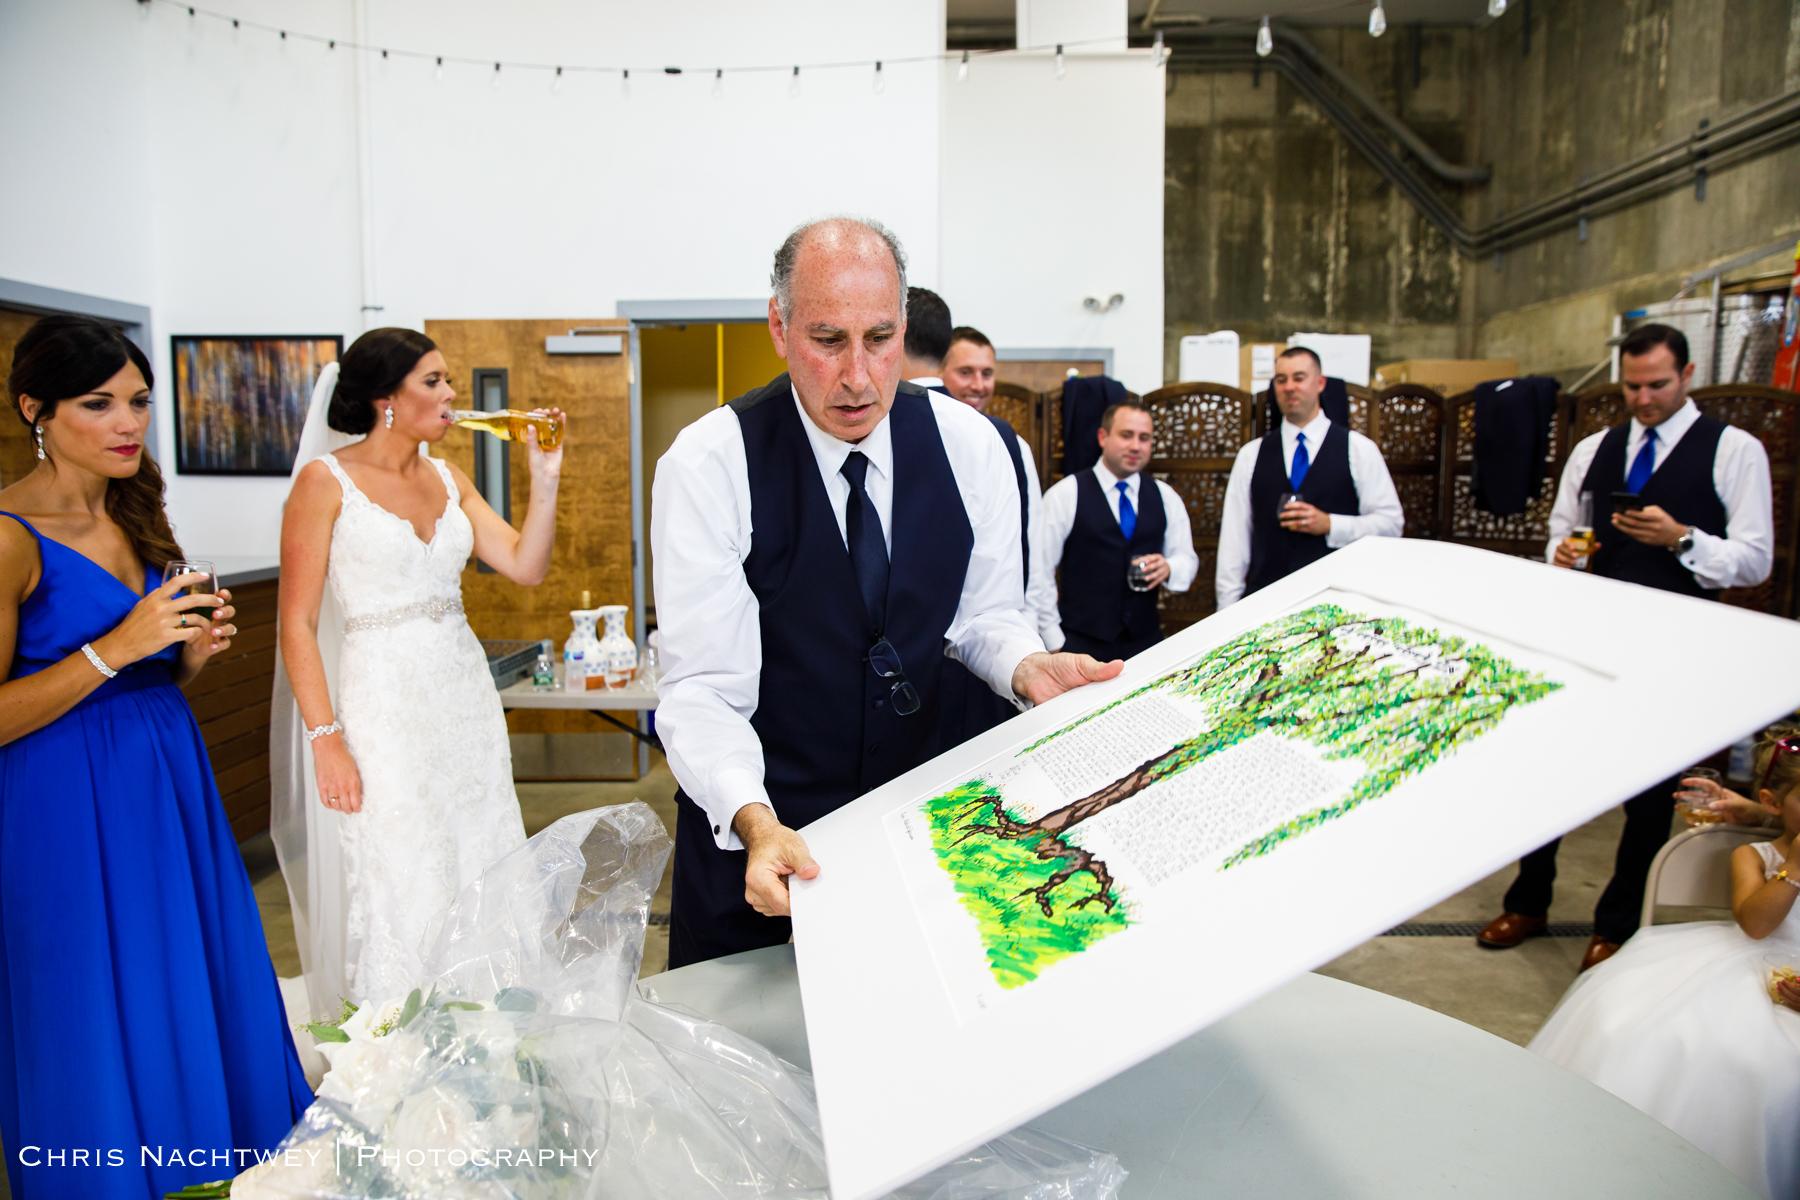 wedding-lake-of-isles-photos-chris-nachtwey-photography-2019-19.jpg